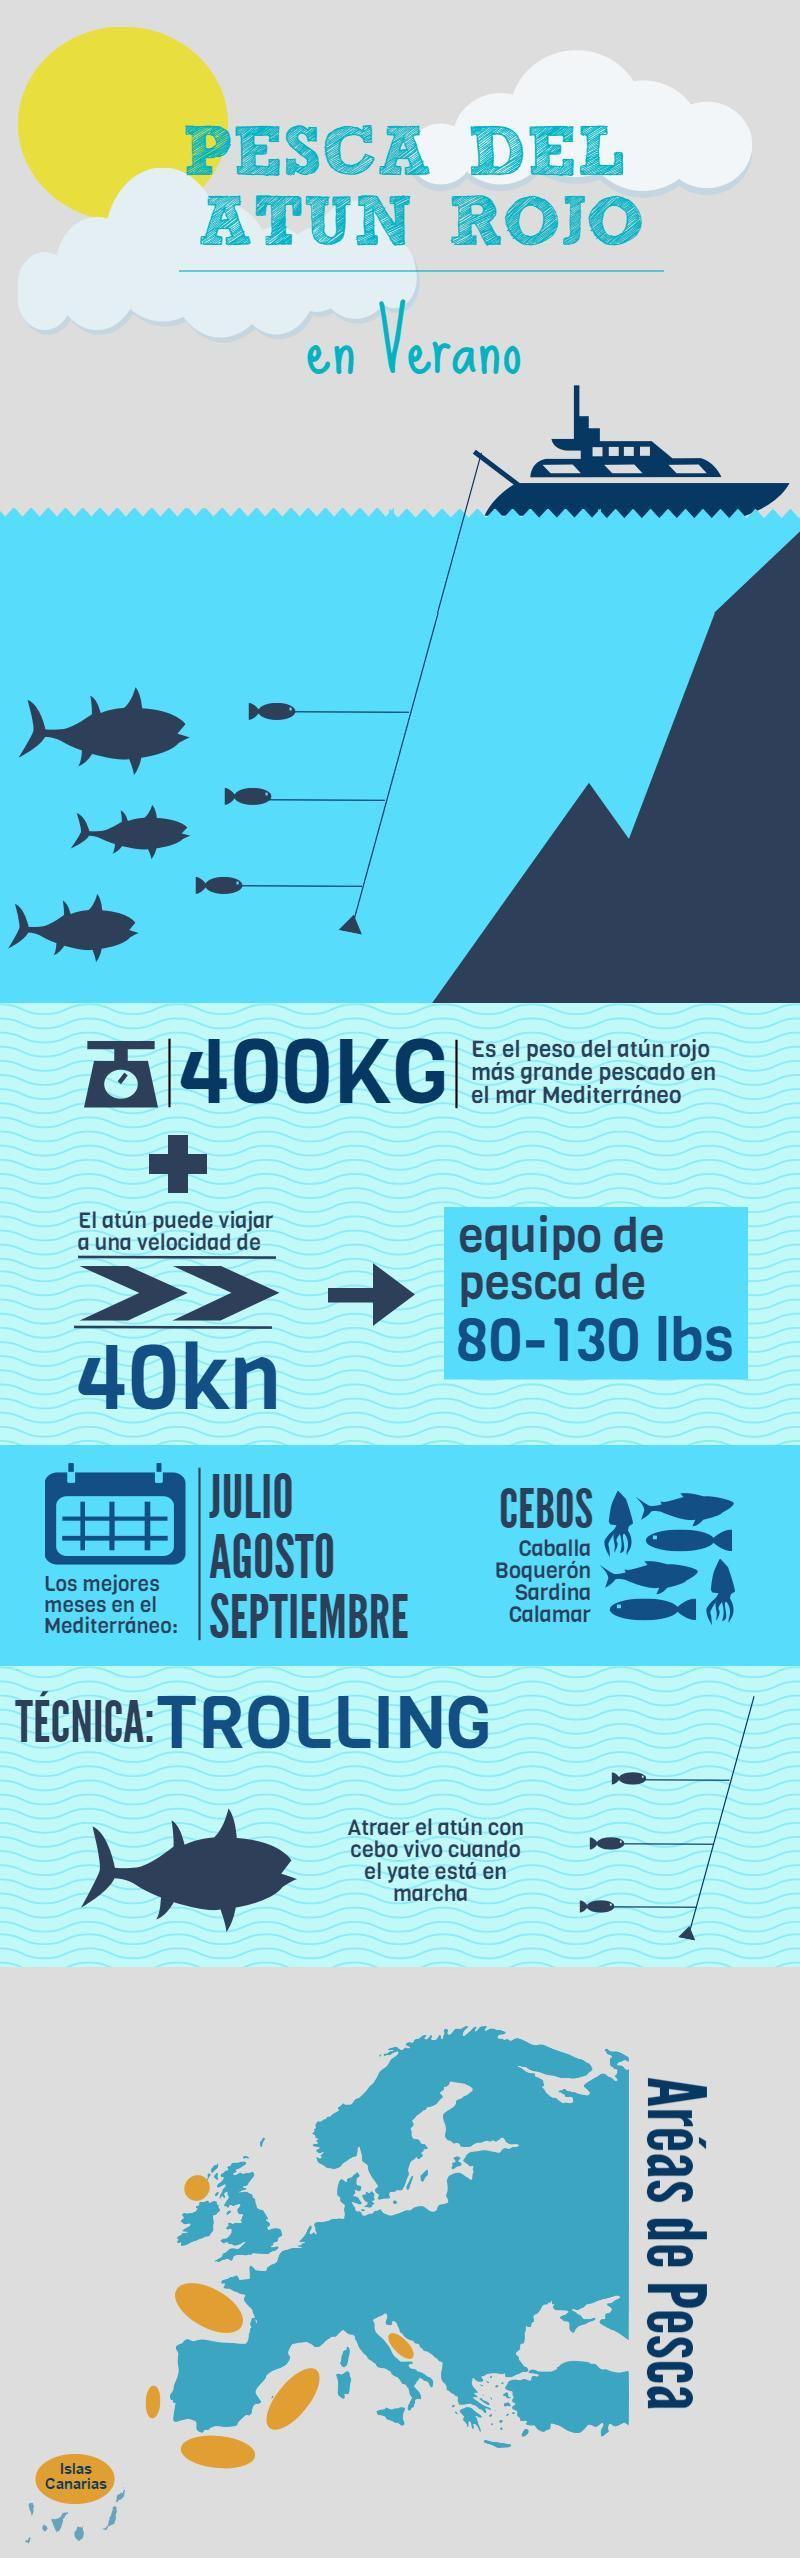 Infografia temporada pesca del atún rojo